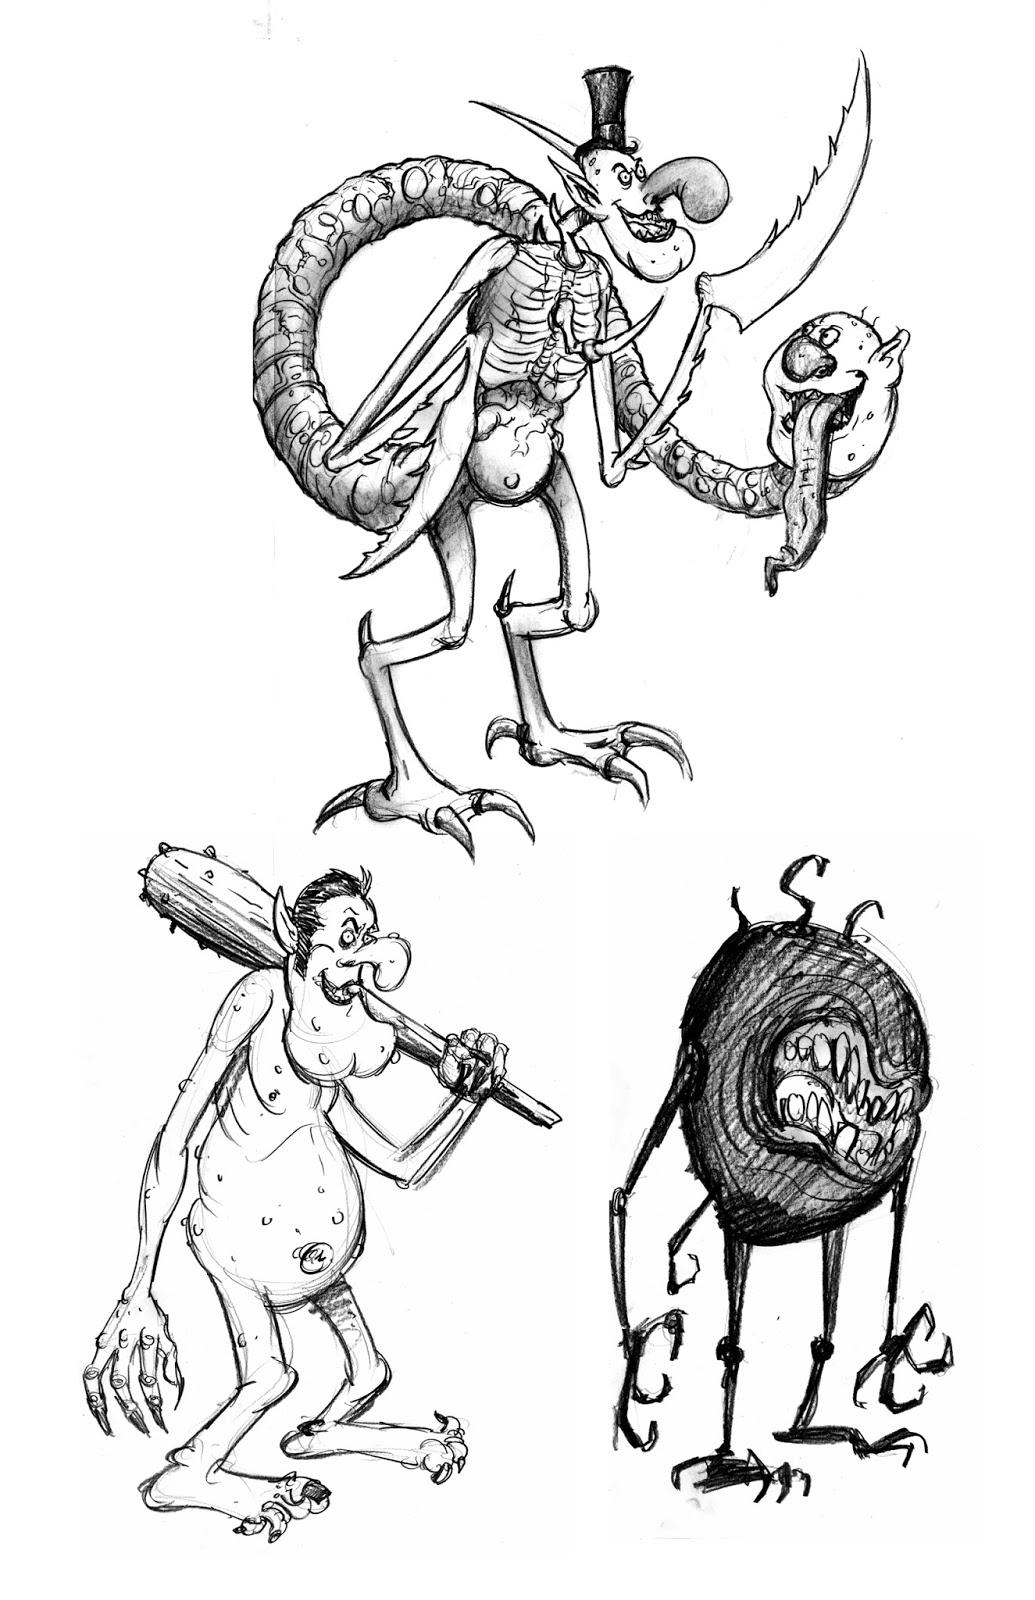 Frank Forte: Billy Boy cartoons sketches